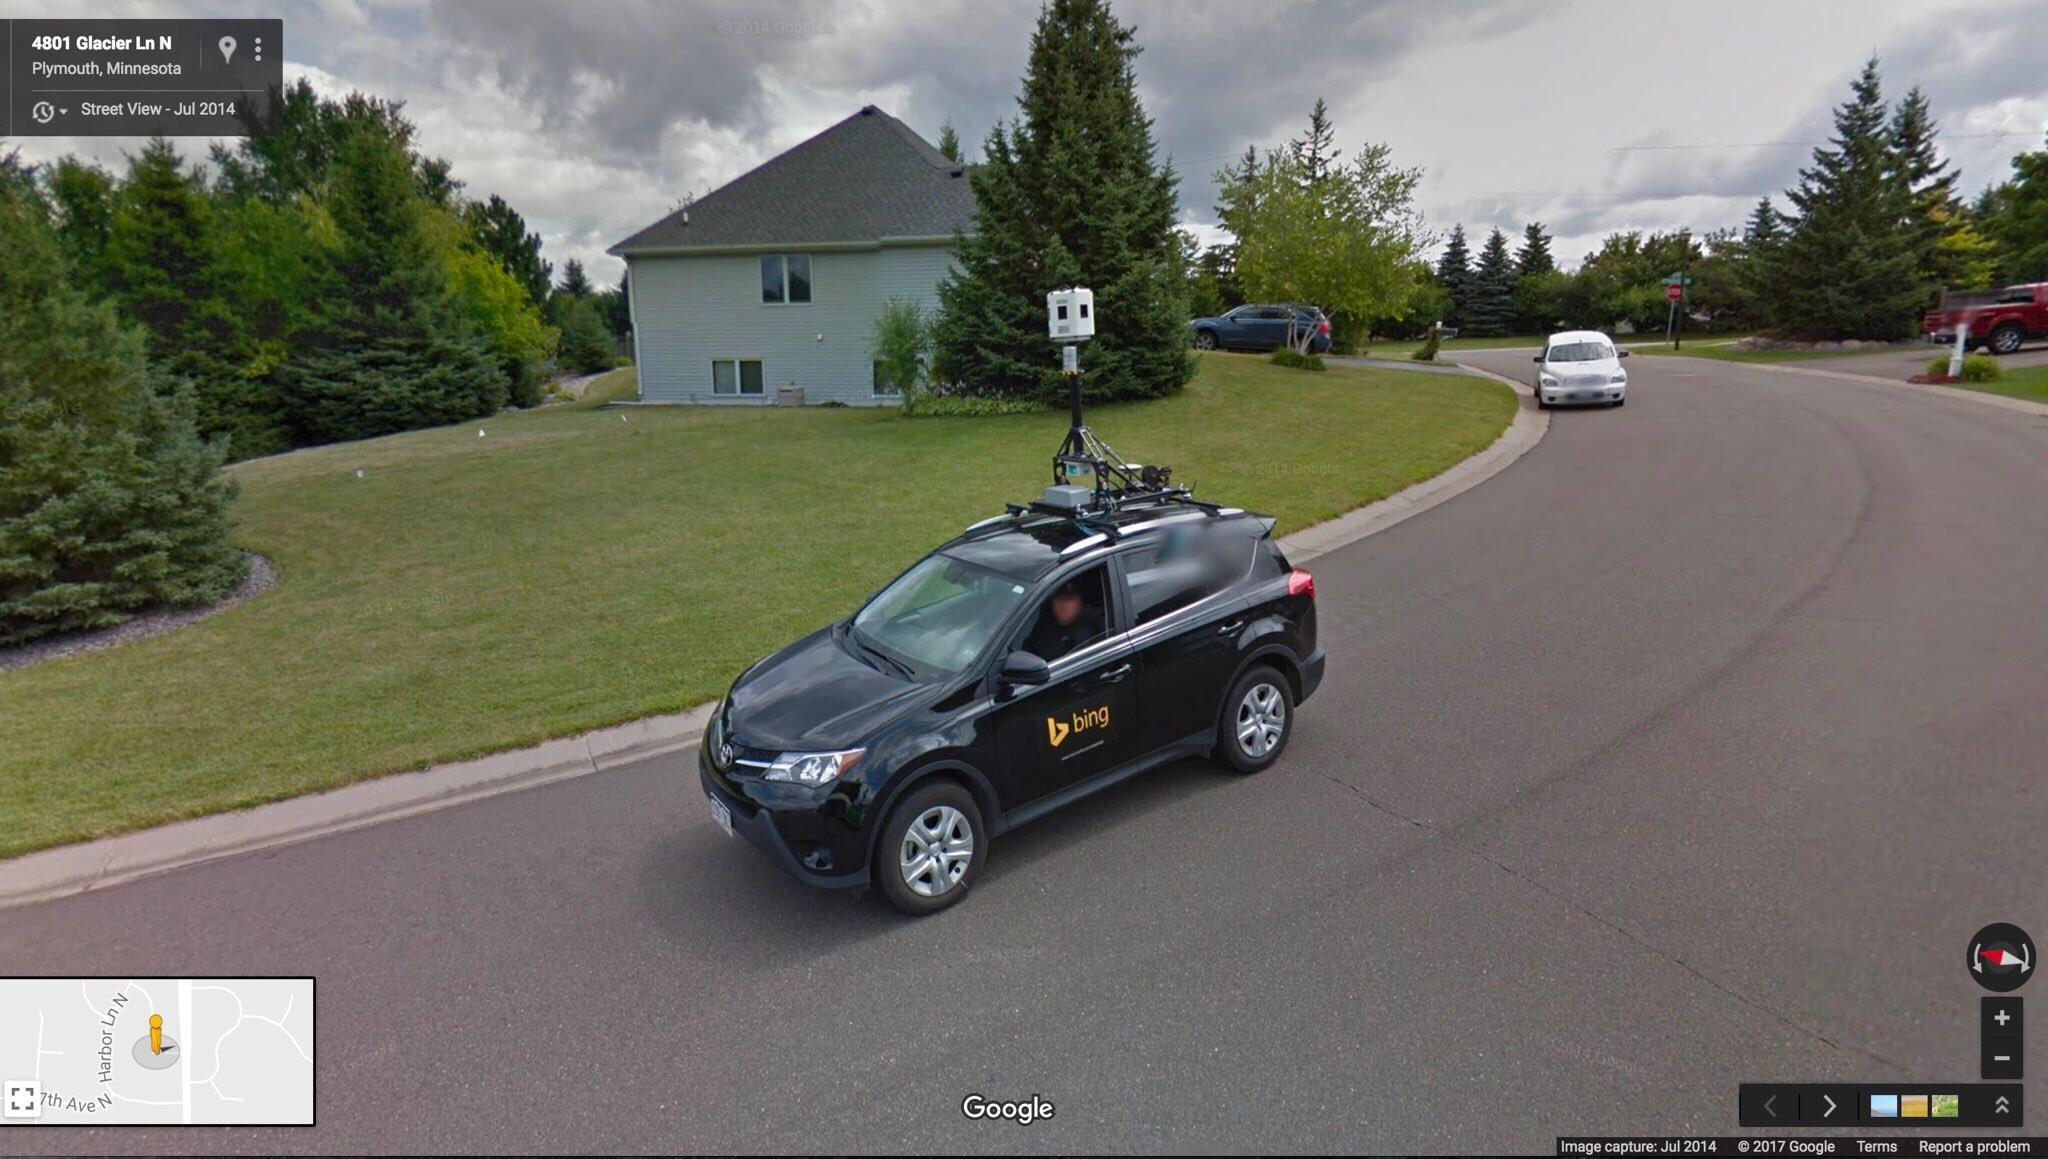 Google Street View registra imagens do Bing Streetside (e vice-versa)